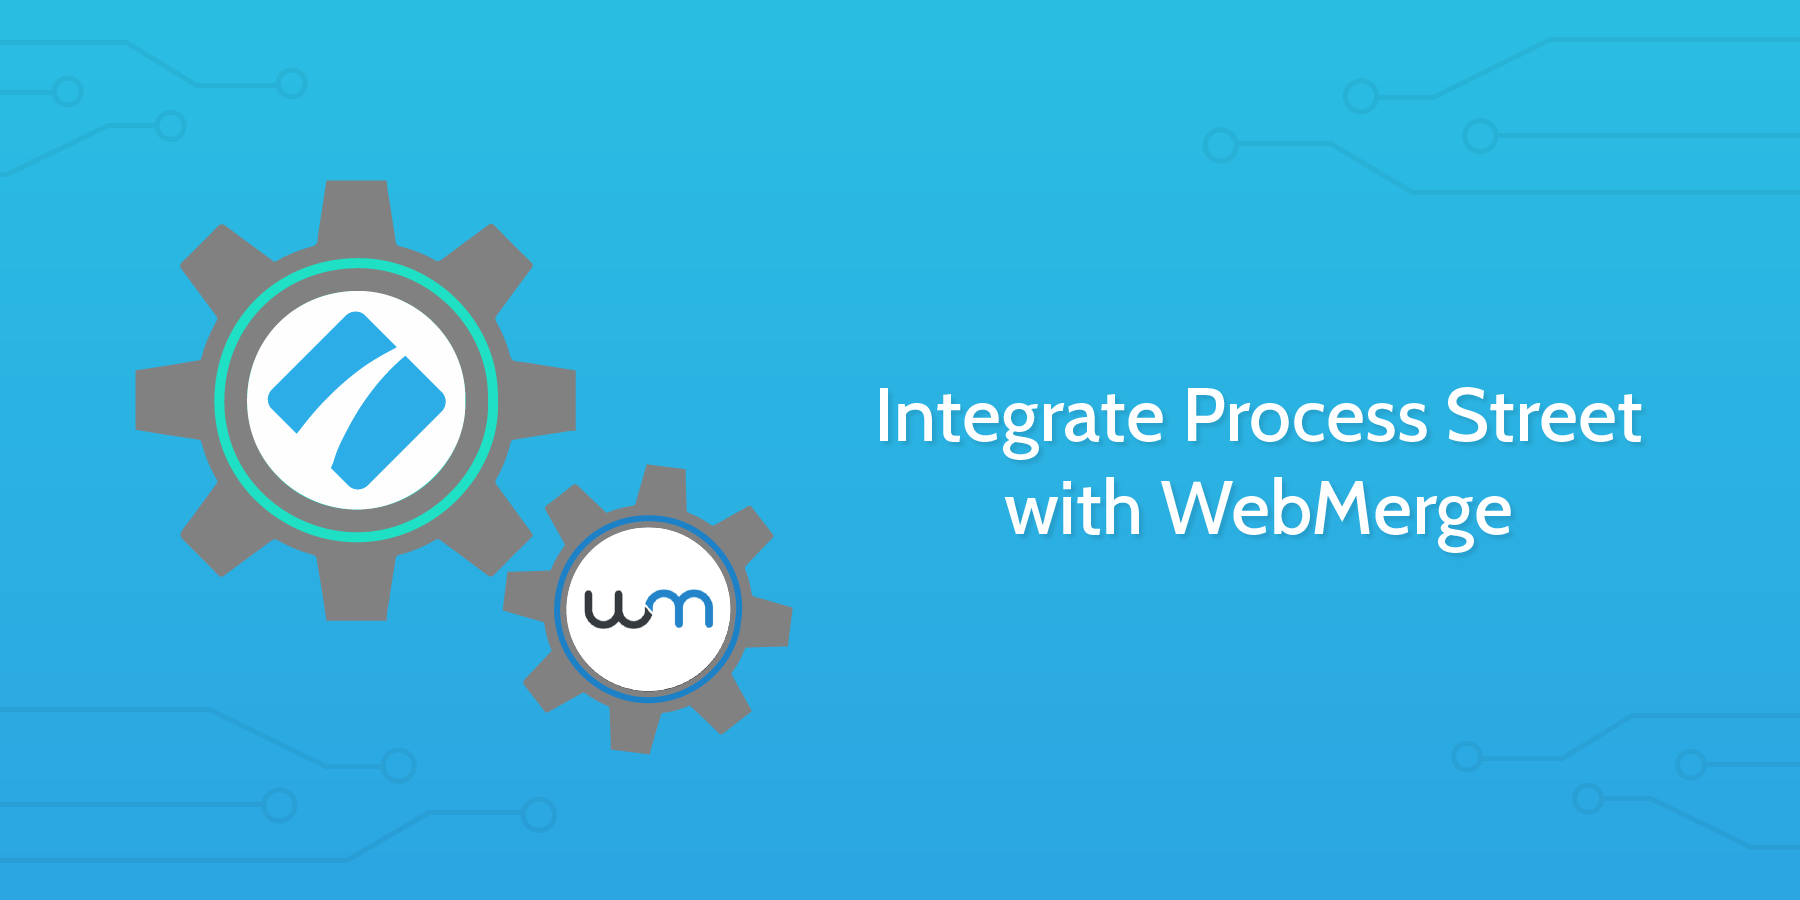 webmerge-process-street-integration1